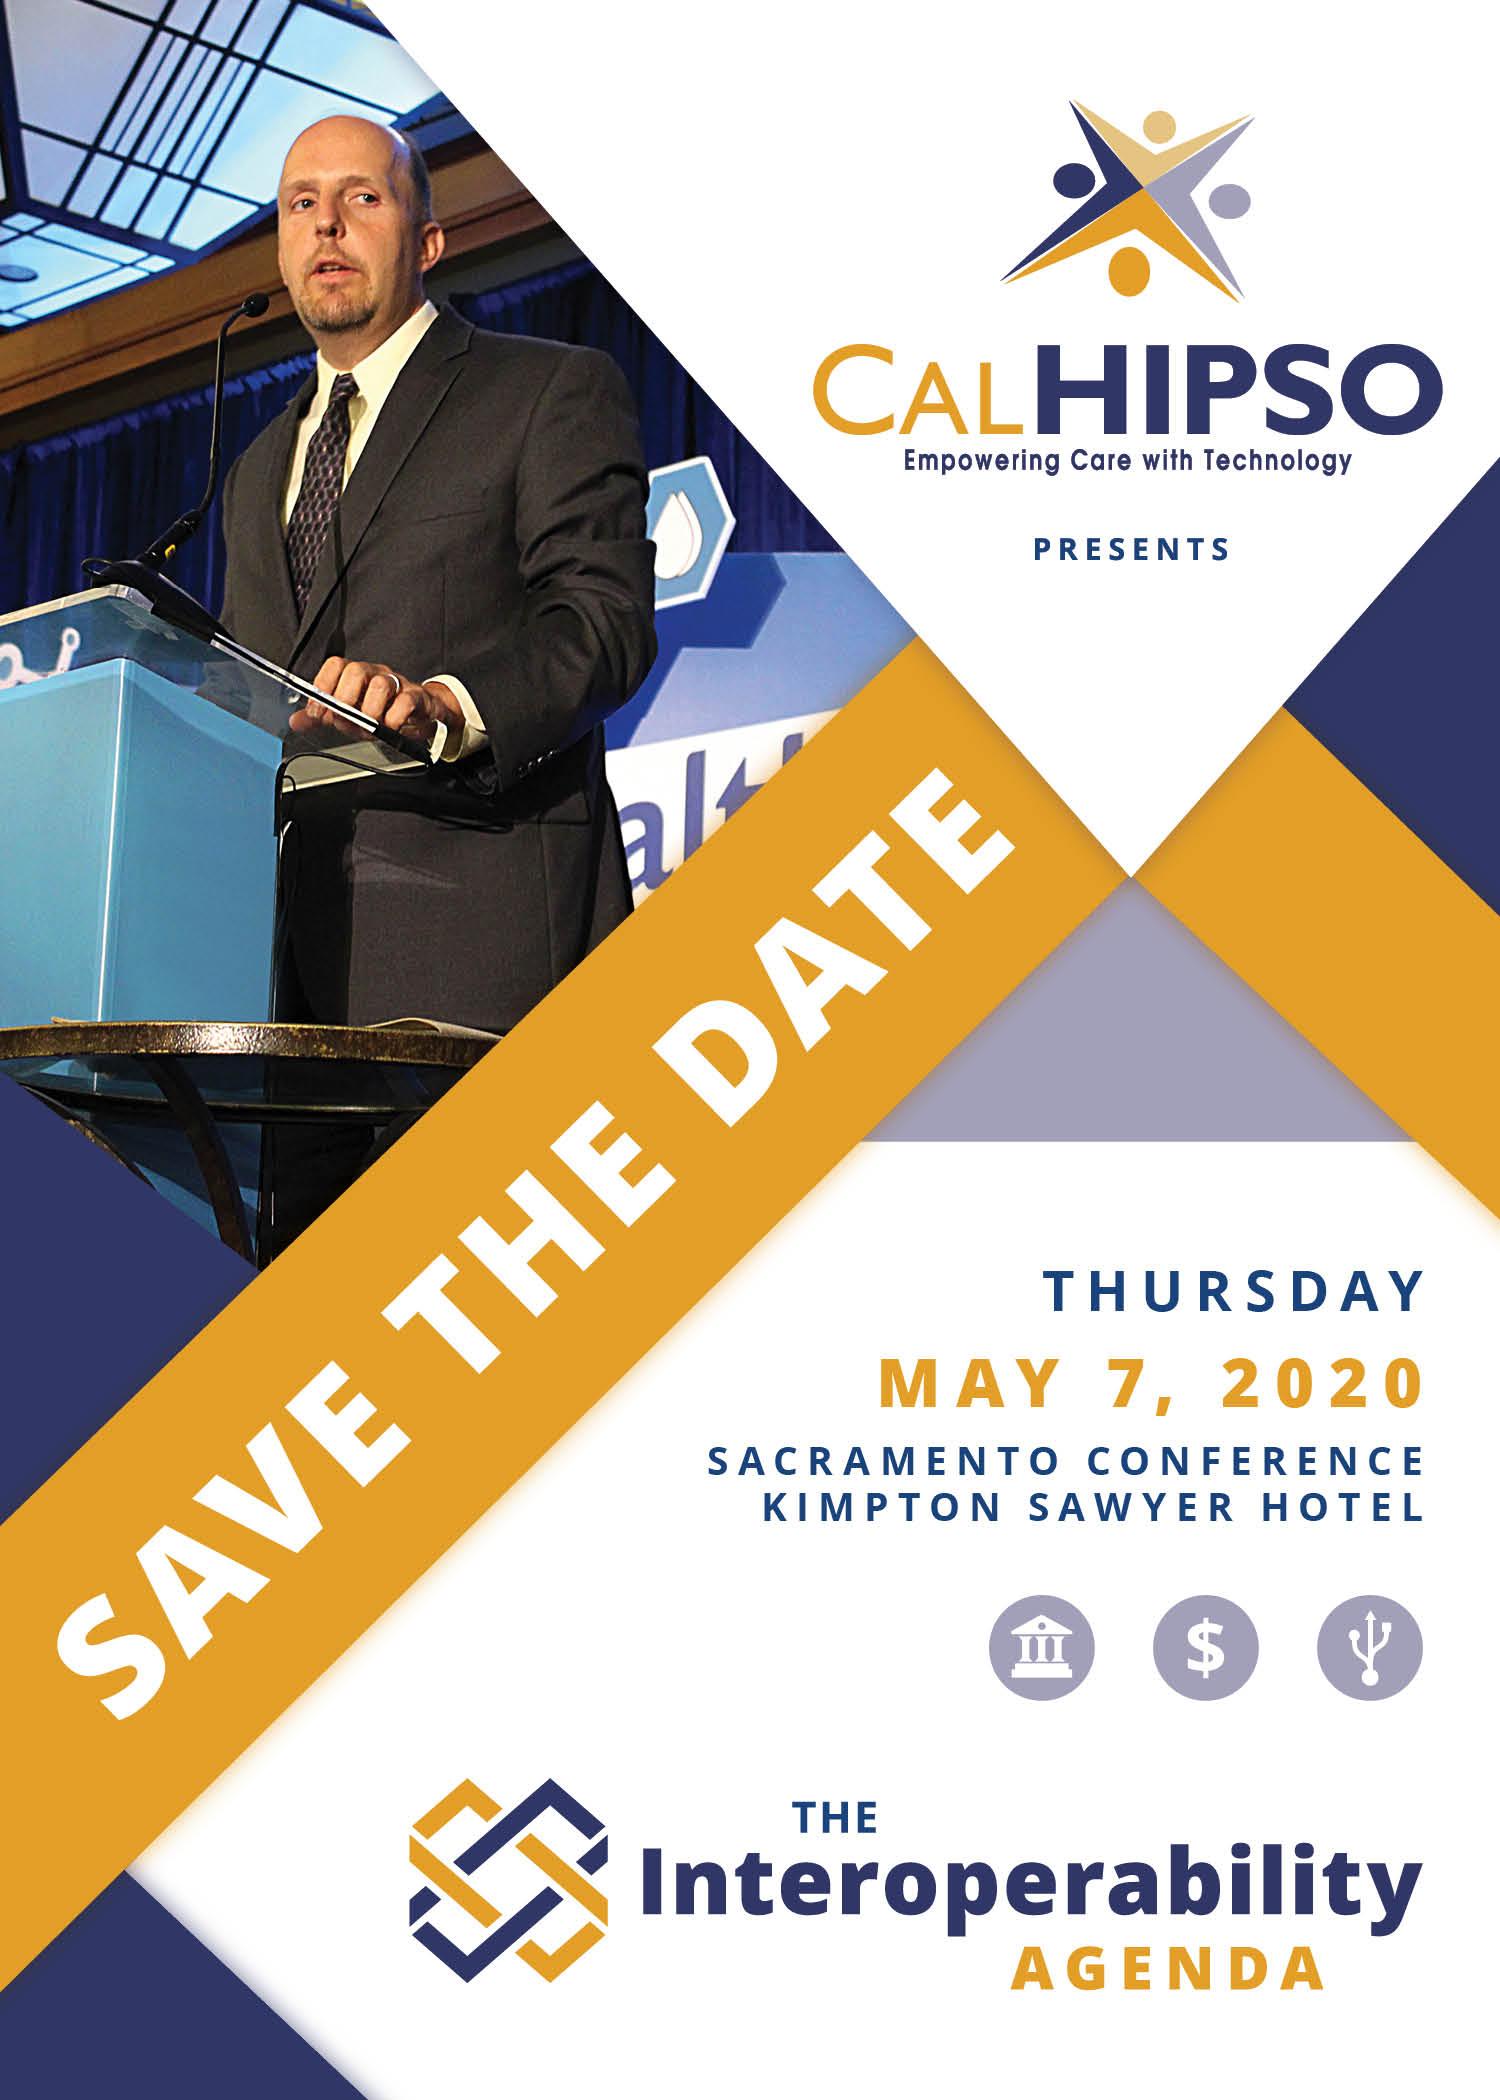 Save the date - Thursday, May 7, 2020. Sacramento Conference. Kimpton Sawyer Hotel.